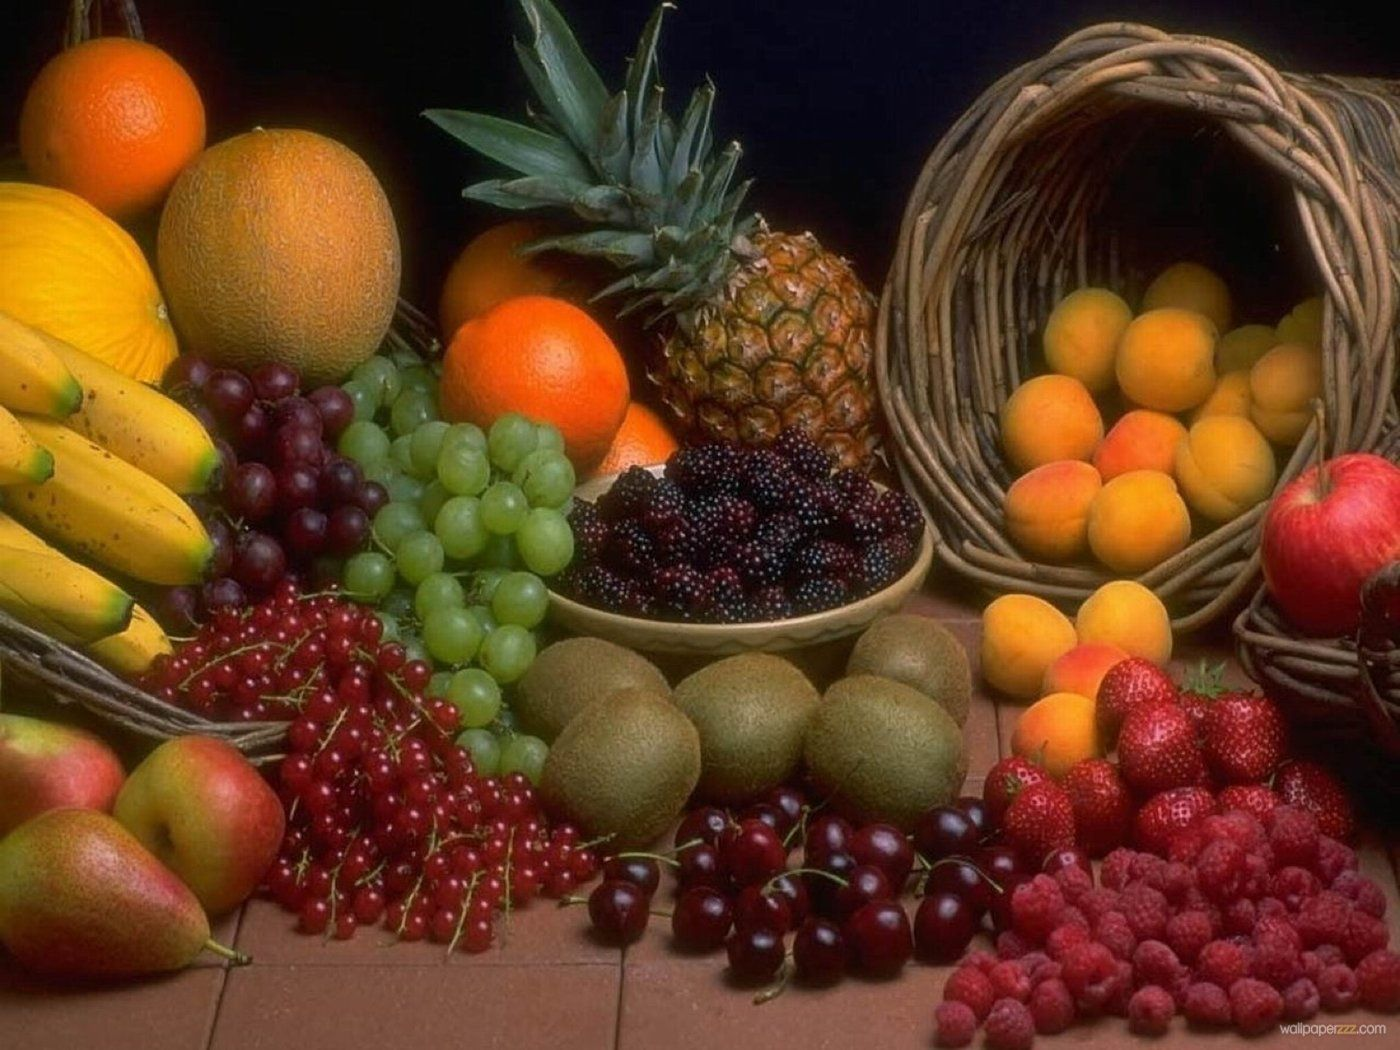 Download Lots Of Fruit Wallpaper Free Wallpaper Raw Food Recipes Healthy Fruits Organic Recipes